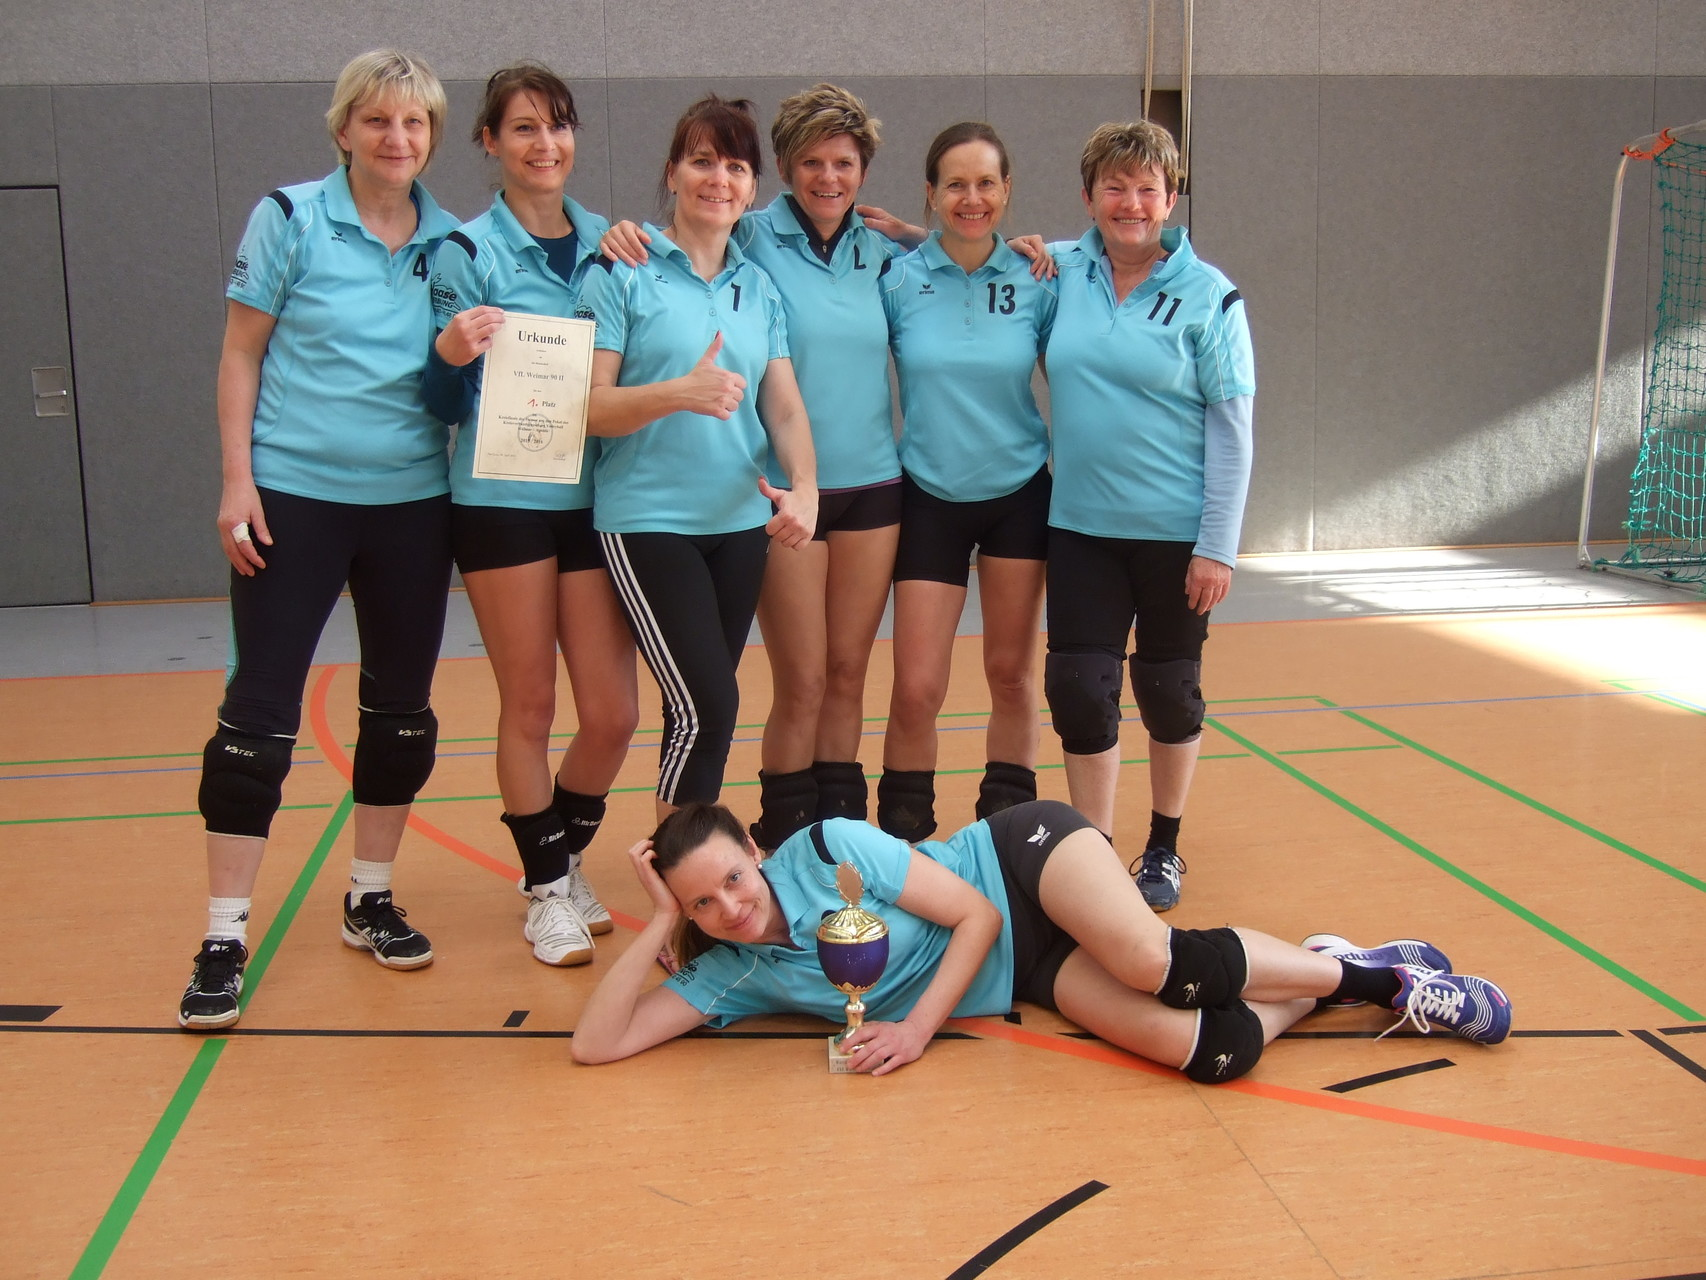 Kreispokalsieger 2015/2016: VfL Weimar '90 II